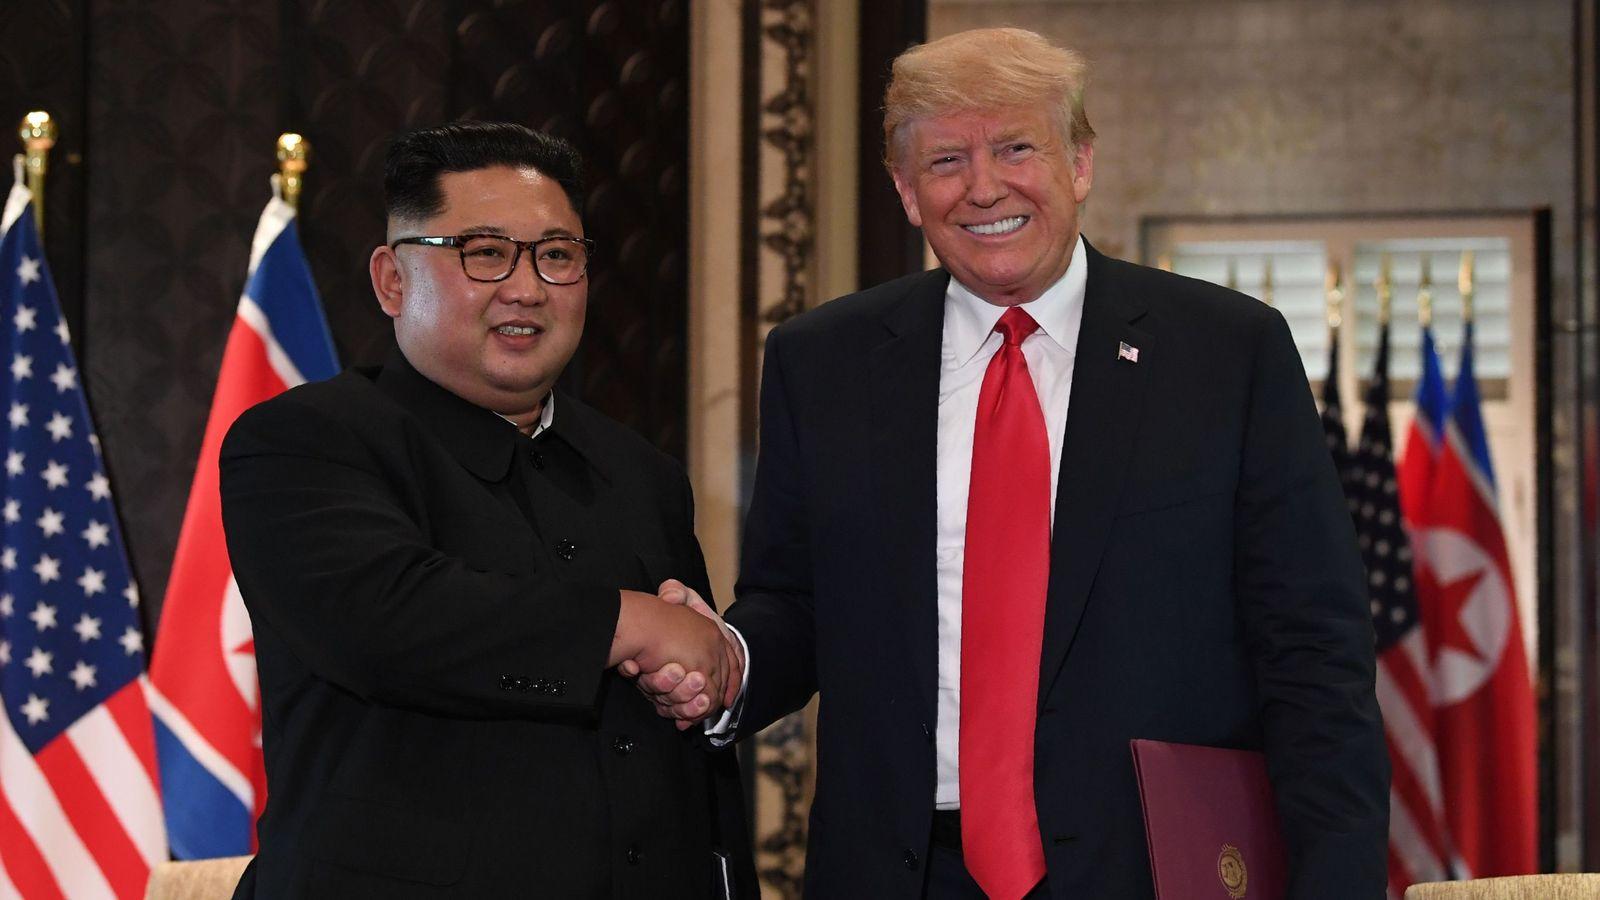 Trump on Kim Jong Un: 'We fell in love after beautiful ...